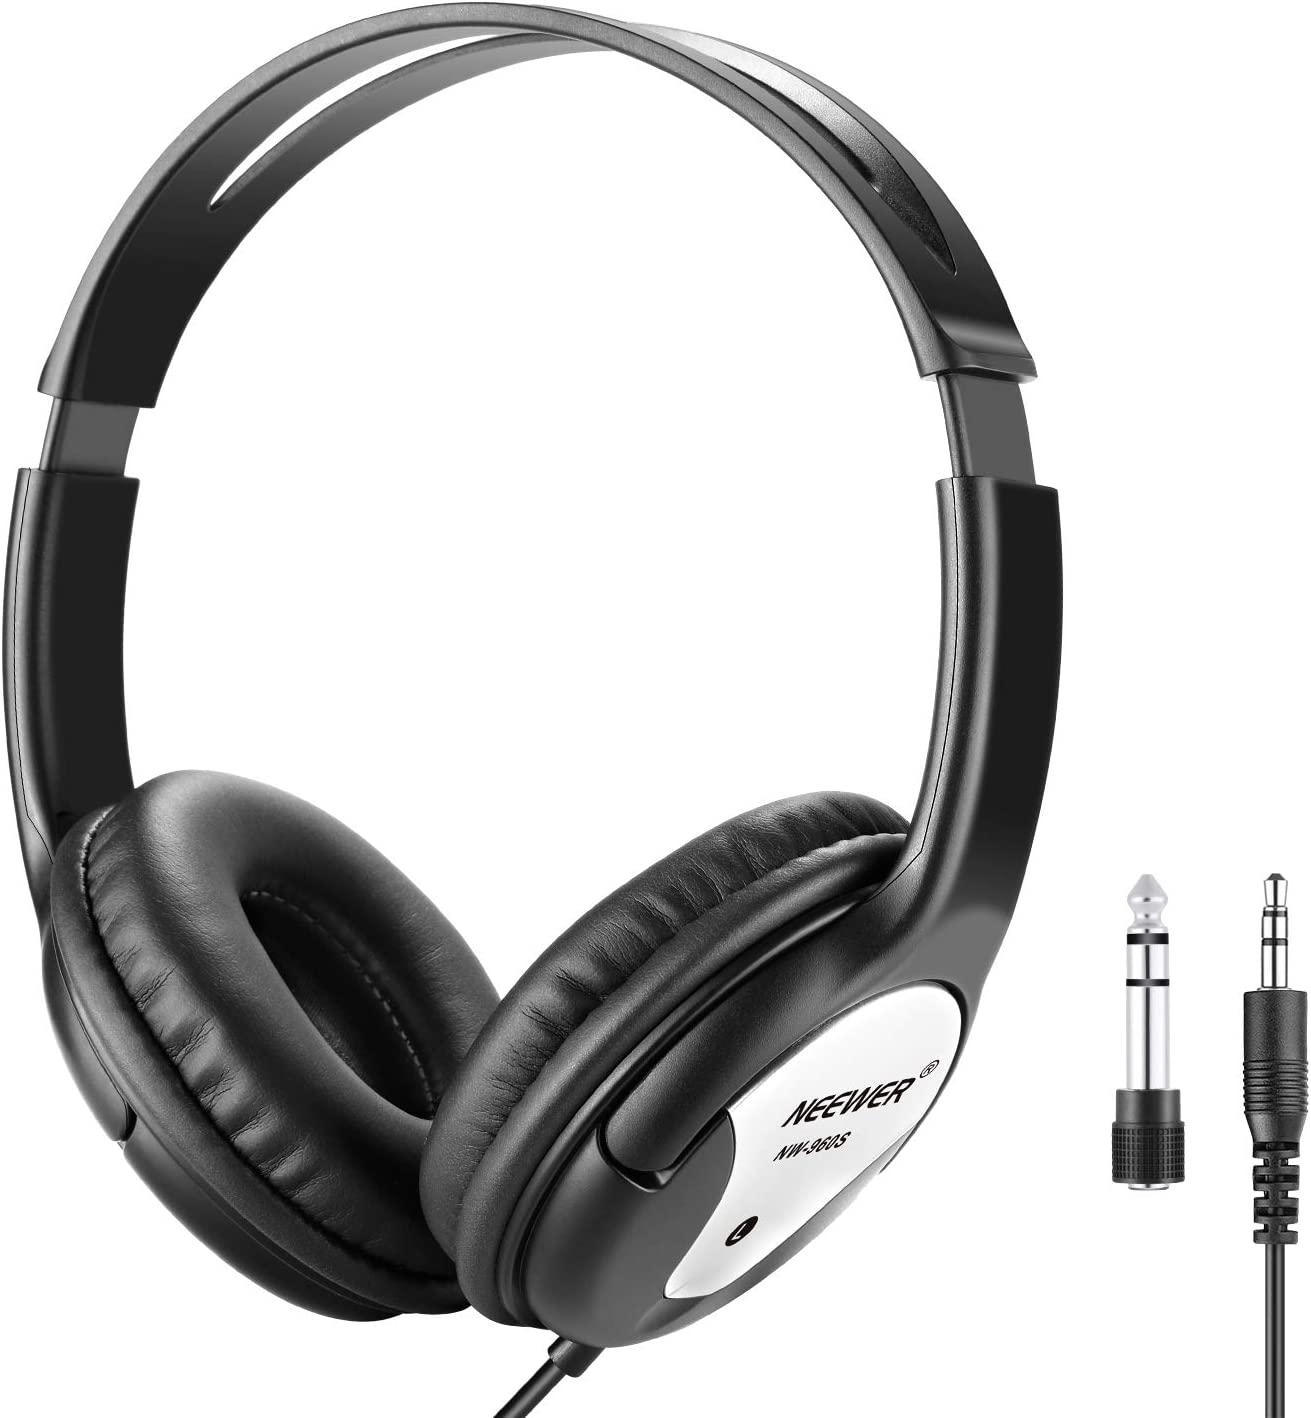 Neewer NW-960S Estudio Monitor Auriculares Plegables Dinámicos con 40mm Lohailer Driver, Cable Desmontable 3 Metros, Adaptador Enchufe 3,5-6,3mm para PC, Smartphones, MP3 (Negro)